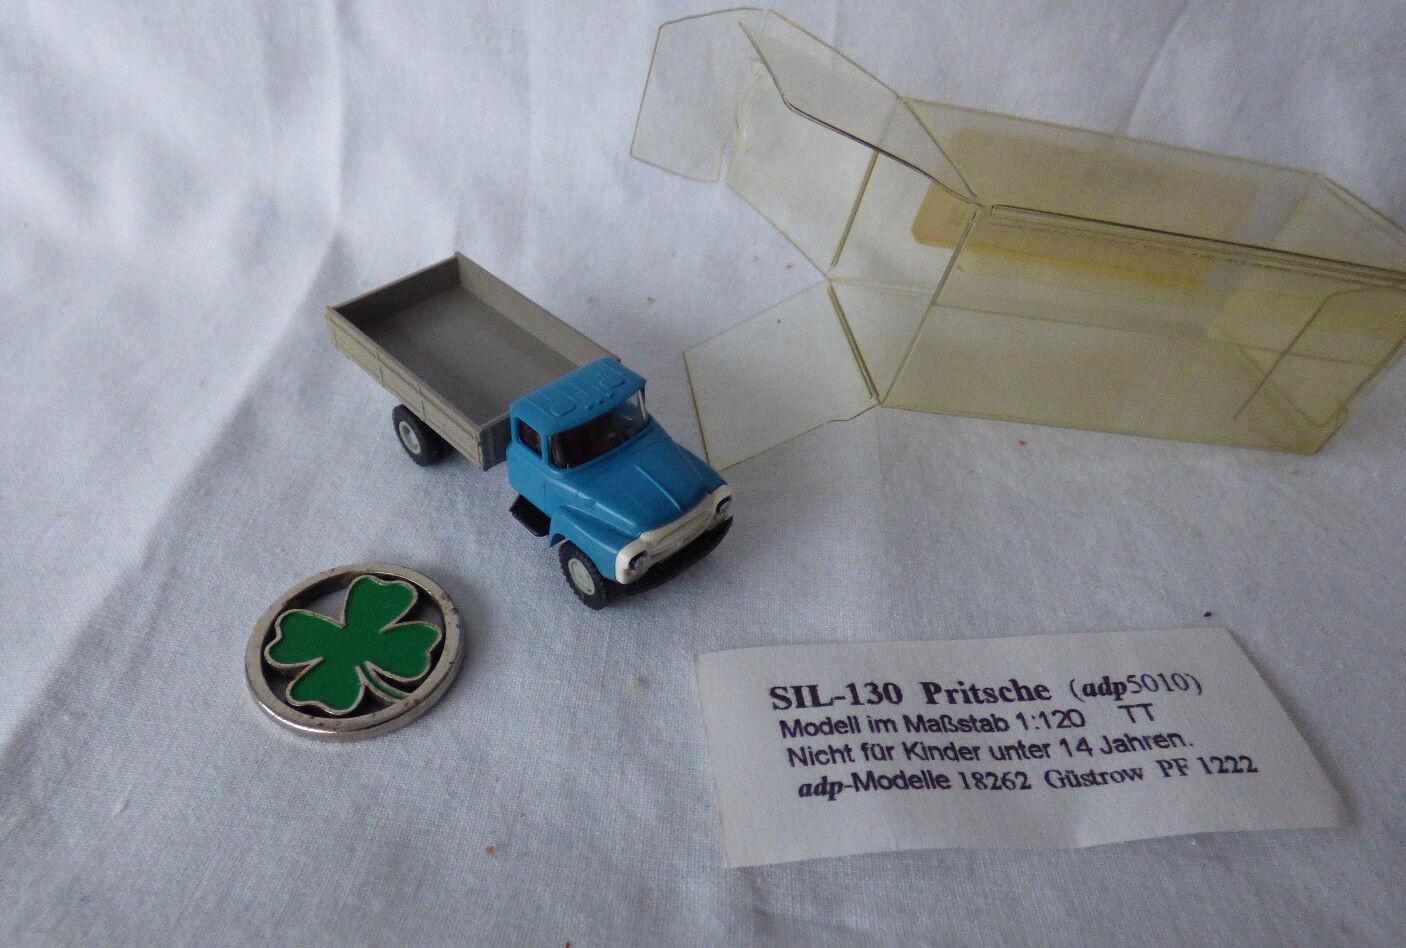 ADP-modèles -1  120 TT-Sil 13 ptitsche